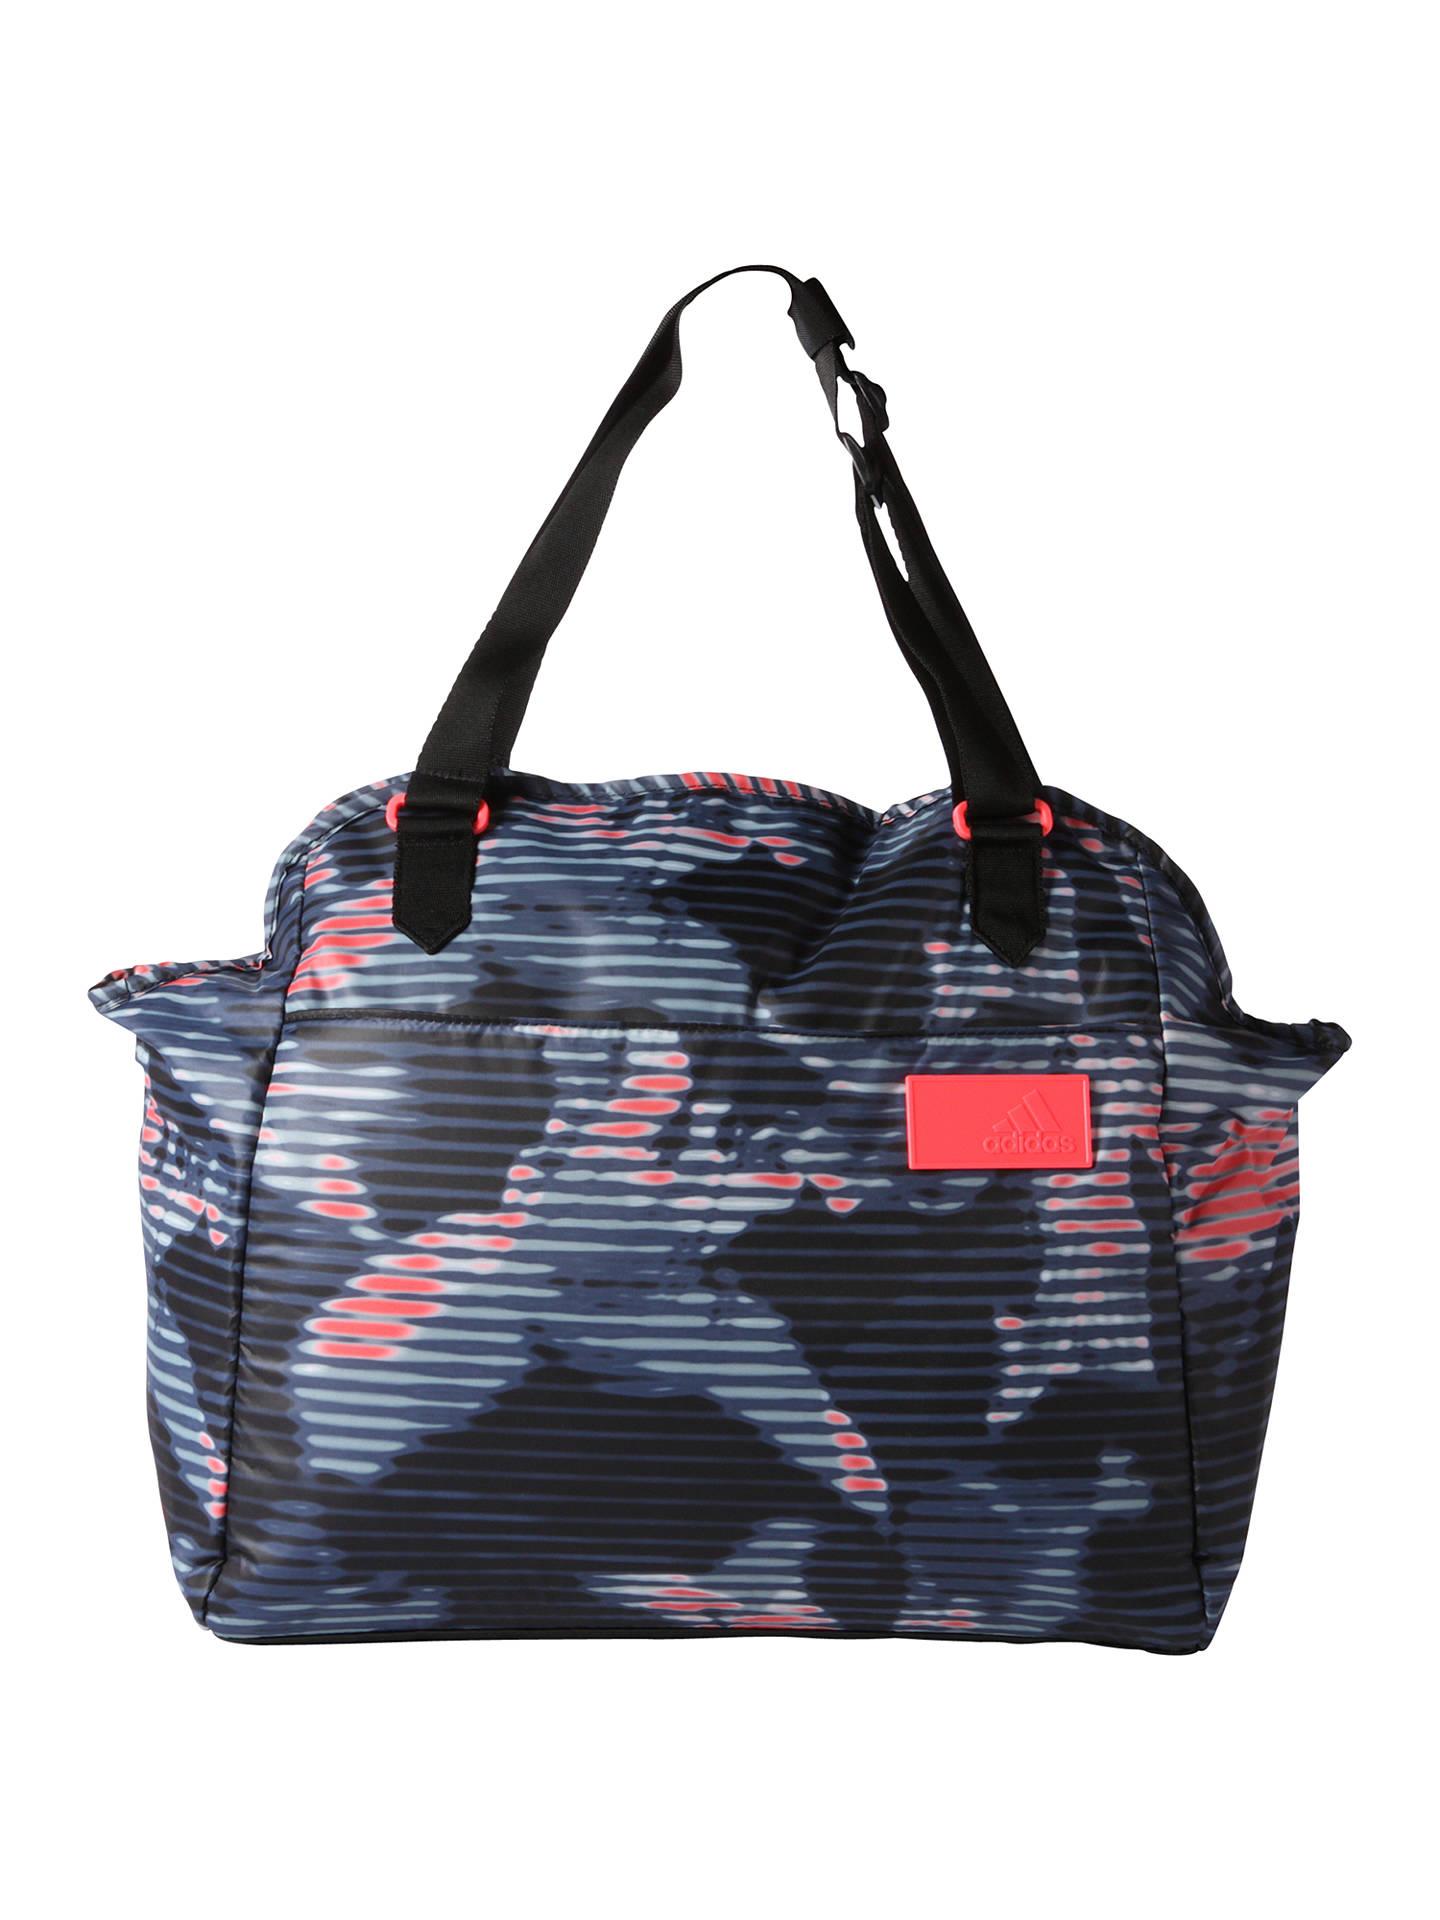 BuyAdidas My Favourite Tote Bag dc0e7095f313e